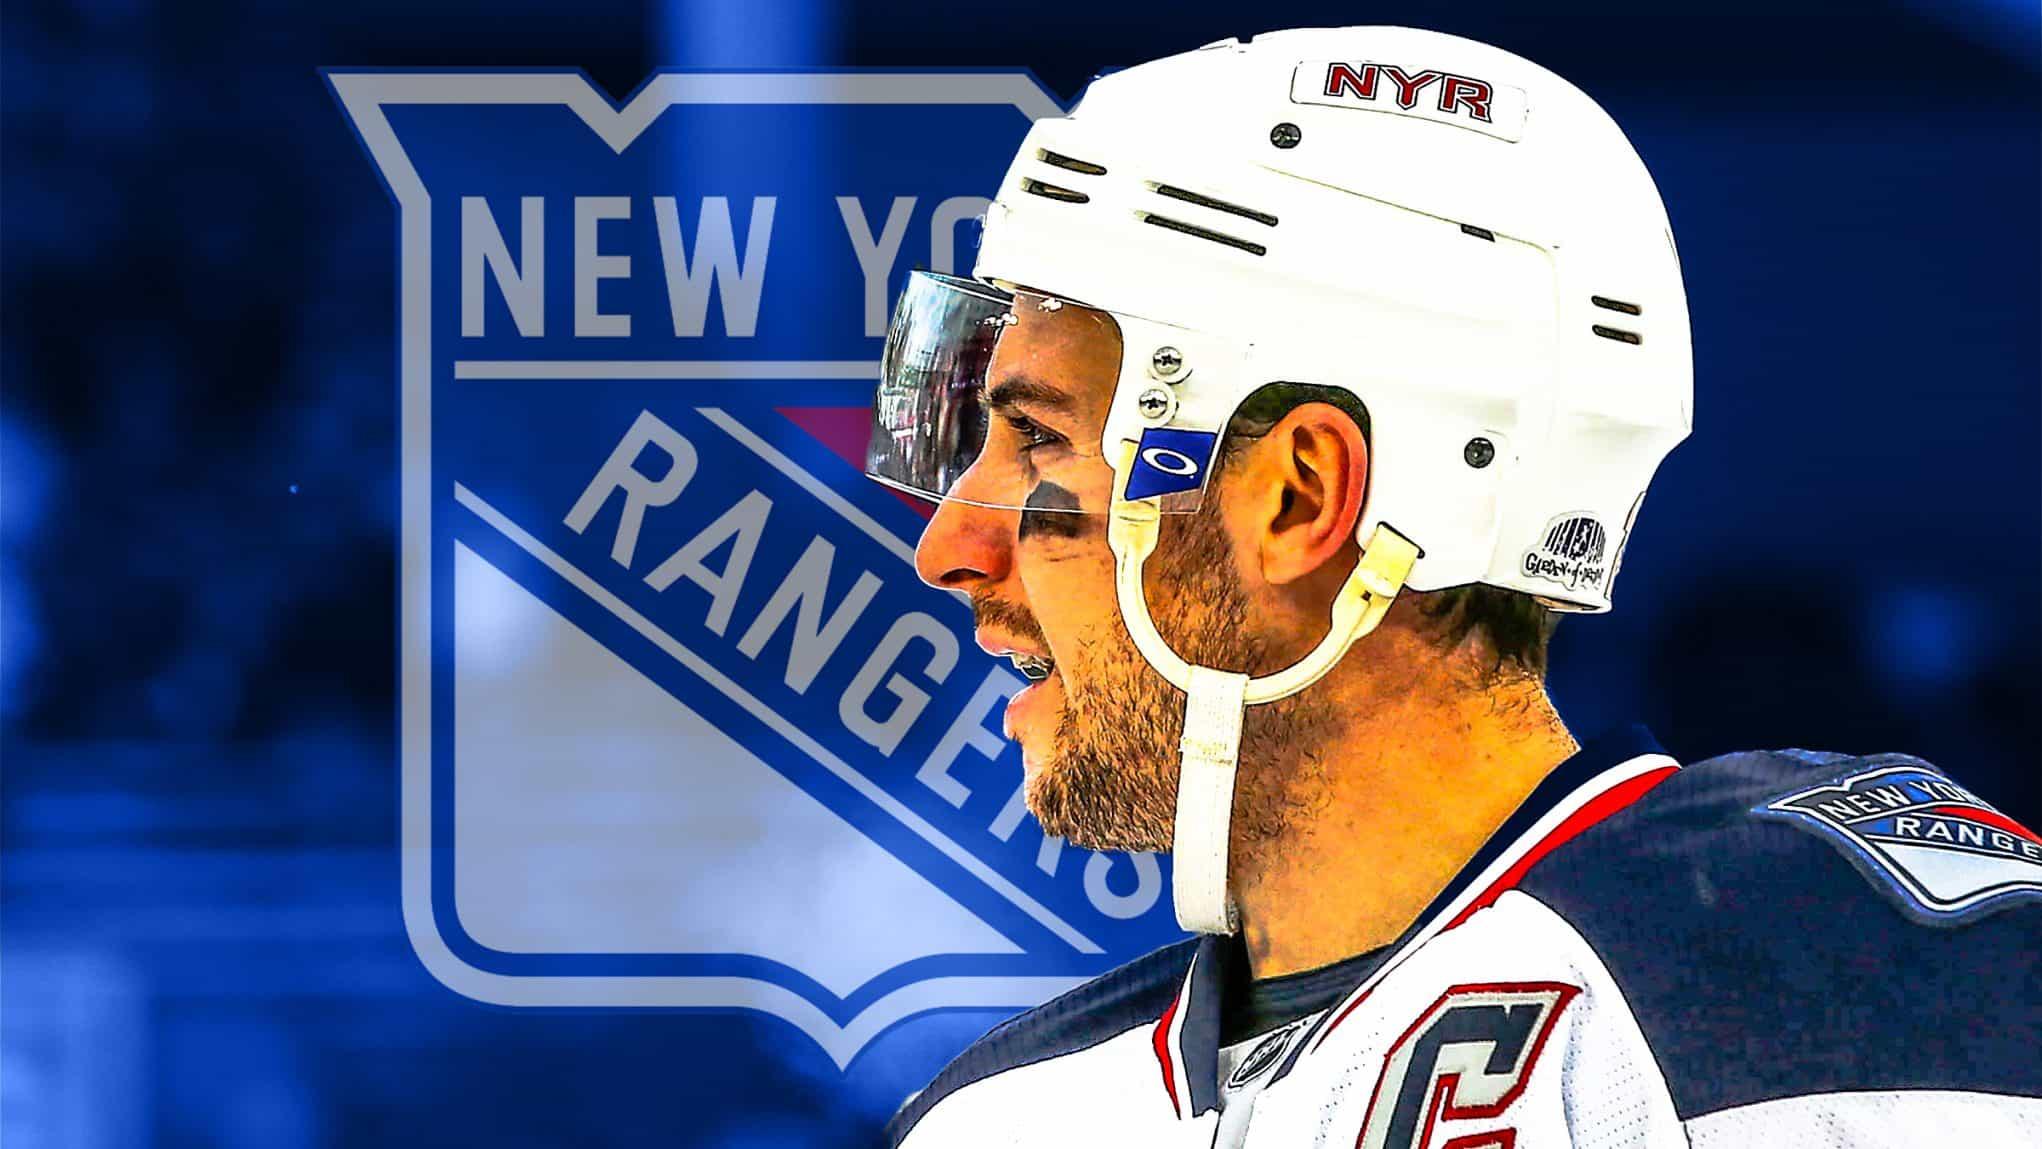 220e4df6bf5 New York Rangers need something other than a Ryan Callahan reunion